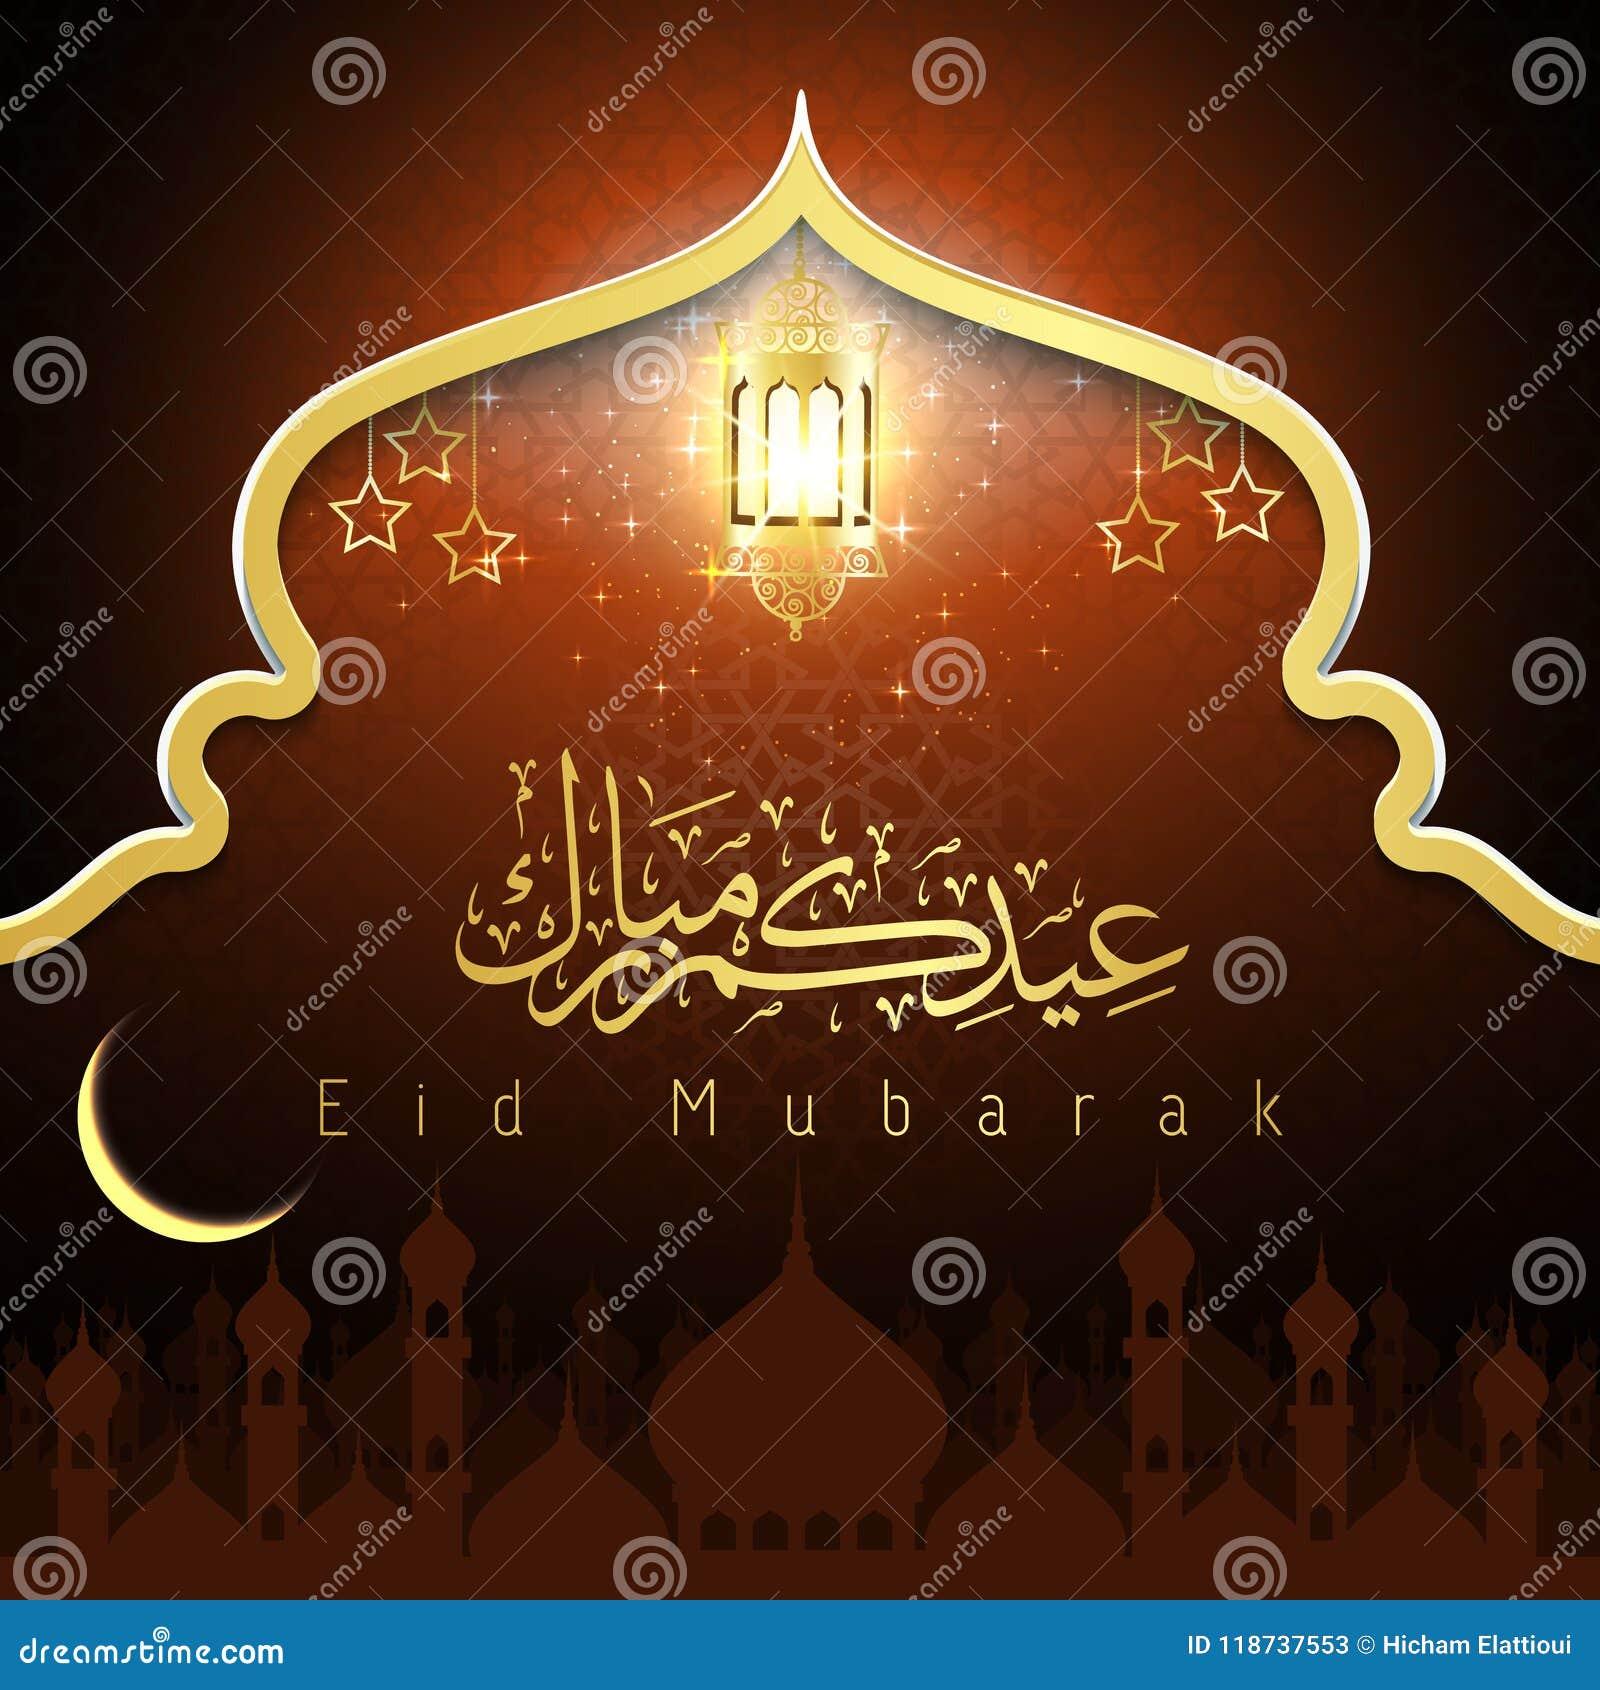 Islamic vector design eid mubarak greeting card template with arabic islamic vector design eid mubarak greeting card template with arabic pattern m4hsunfo